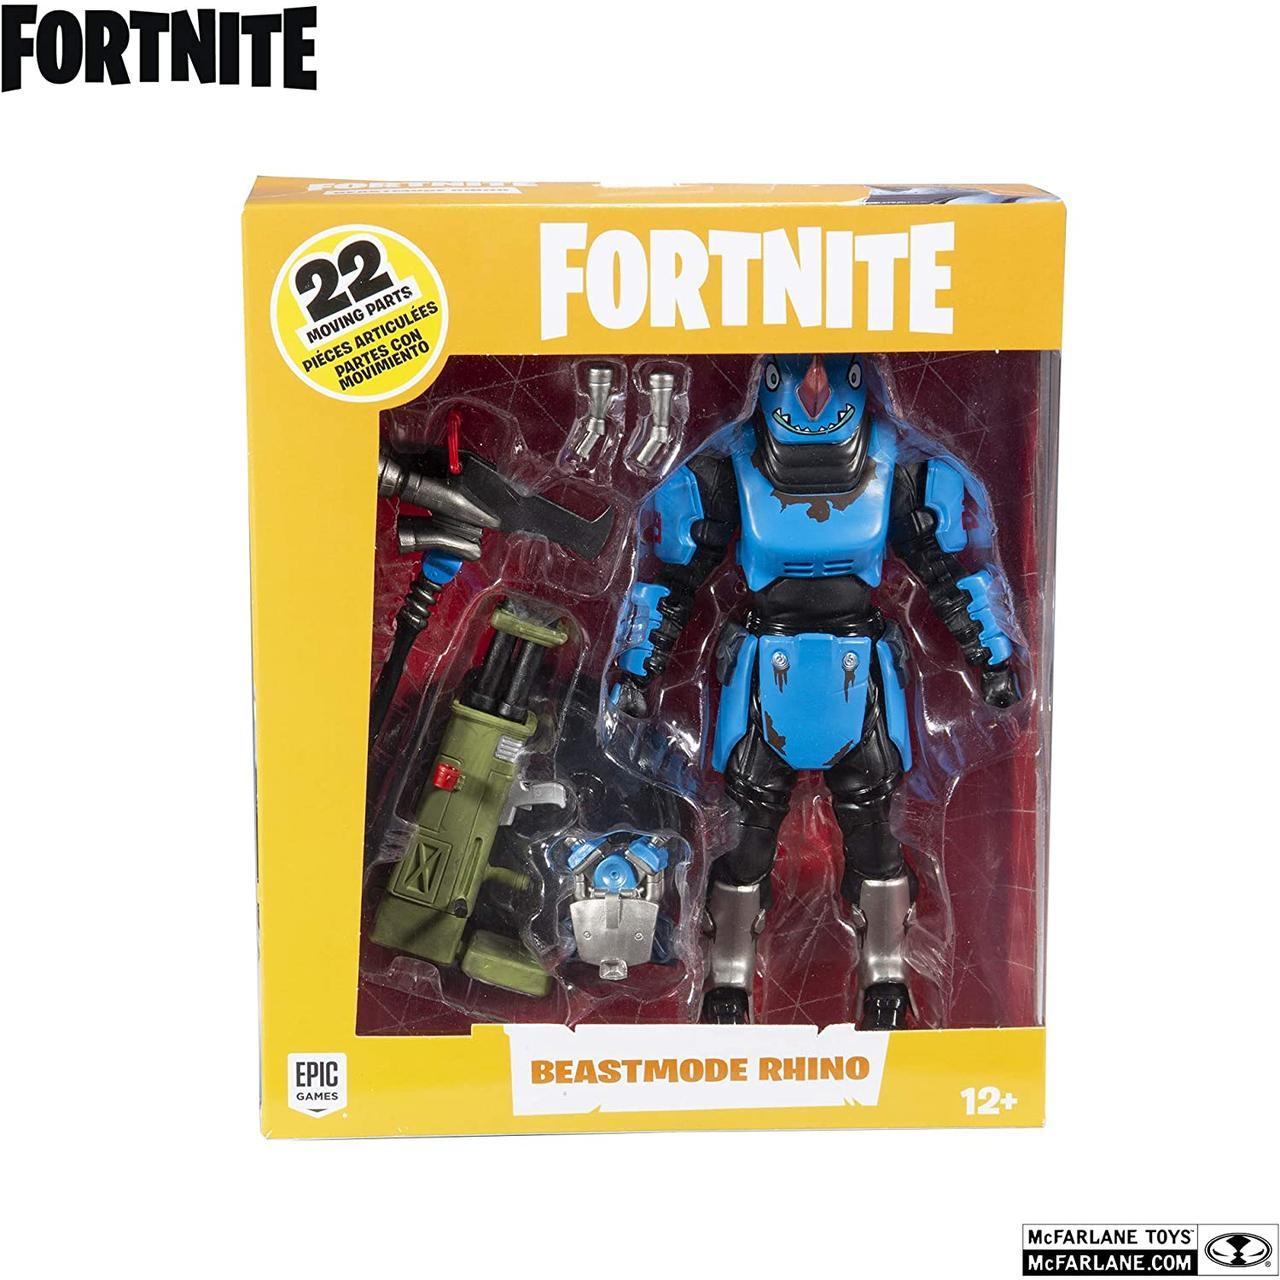 Коллекционная фигурка Фортнайт Рино McFarlane Toys Fortnite Beastmode Rhino Premium Action Figure